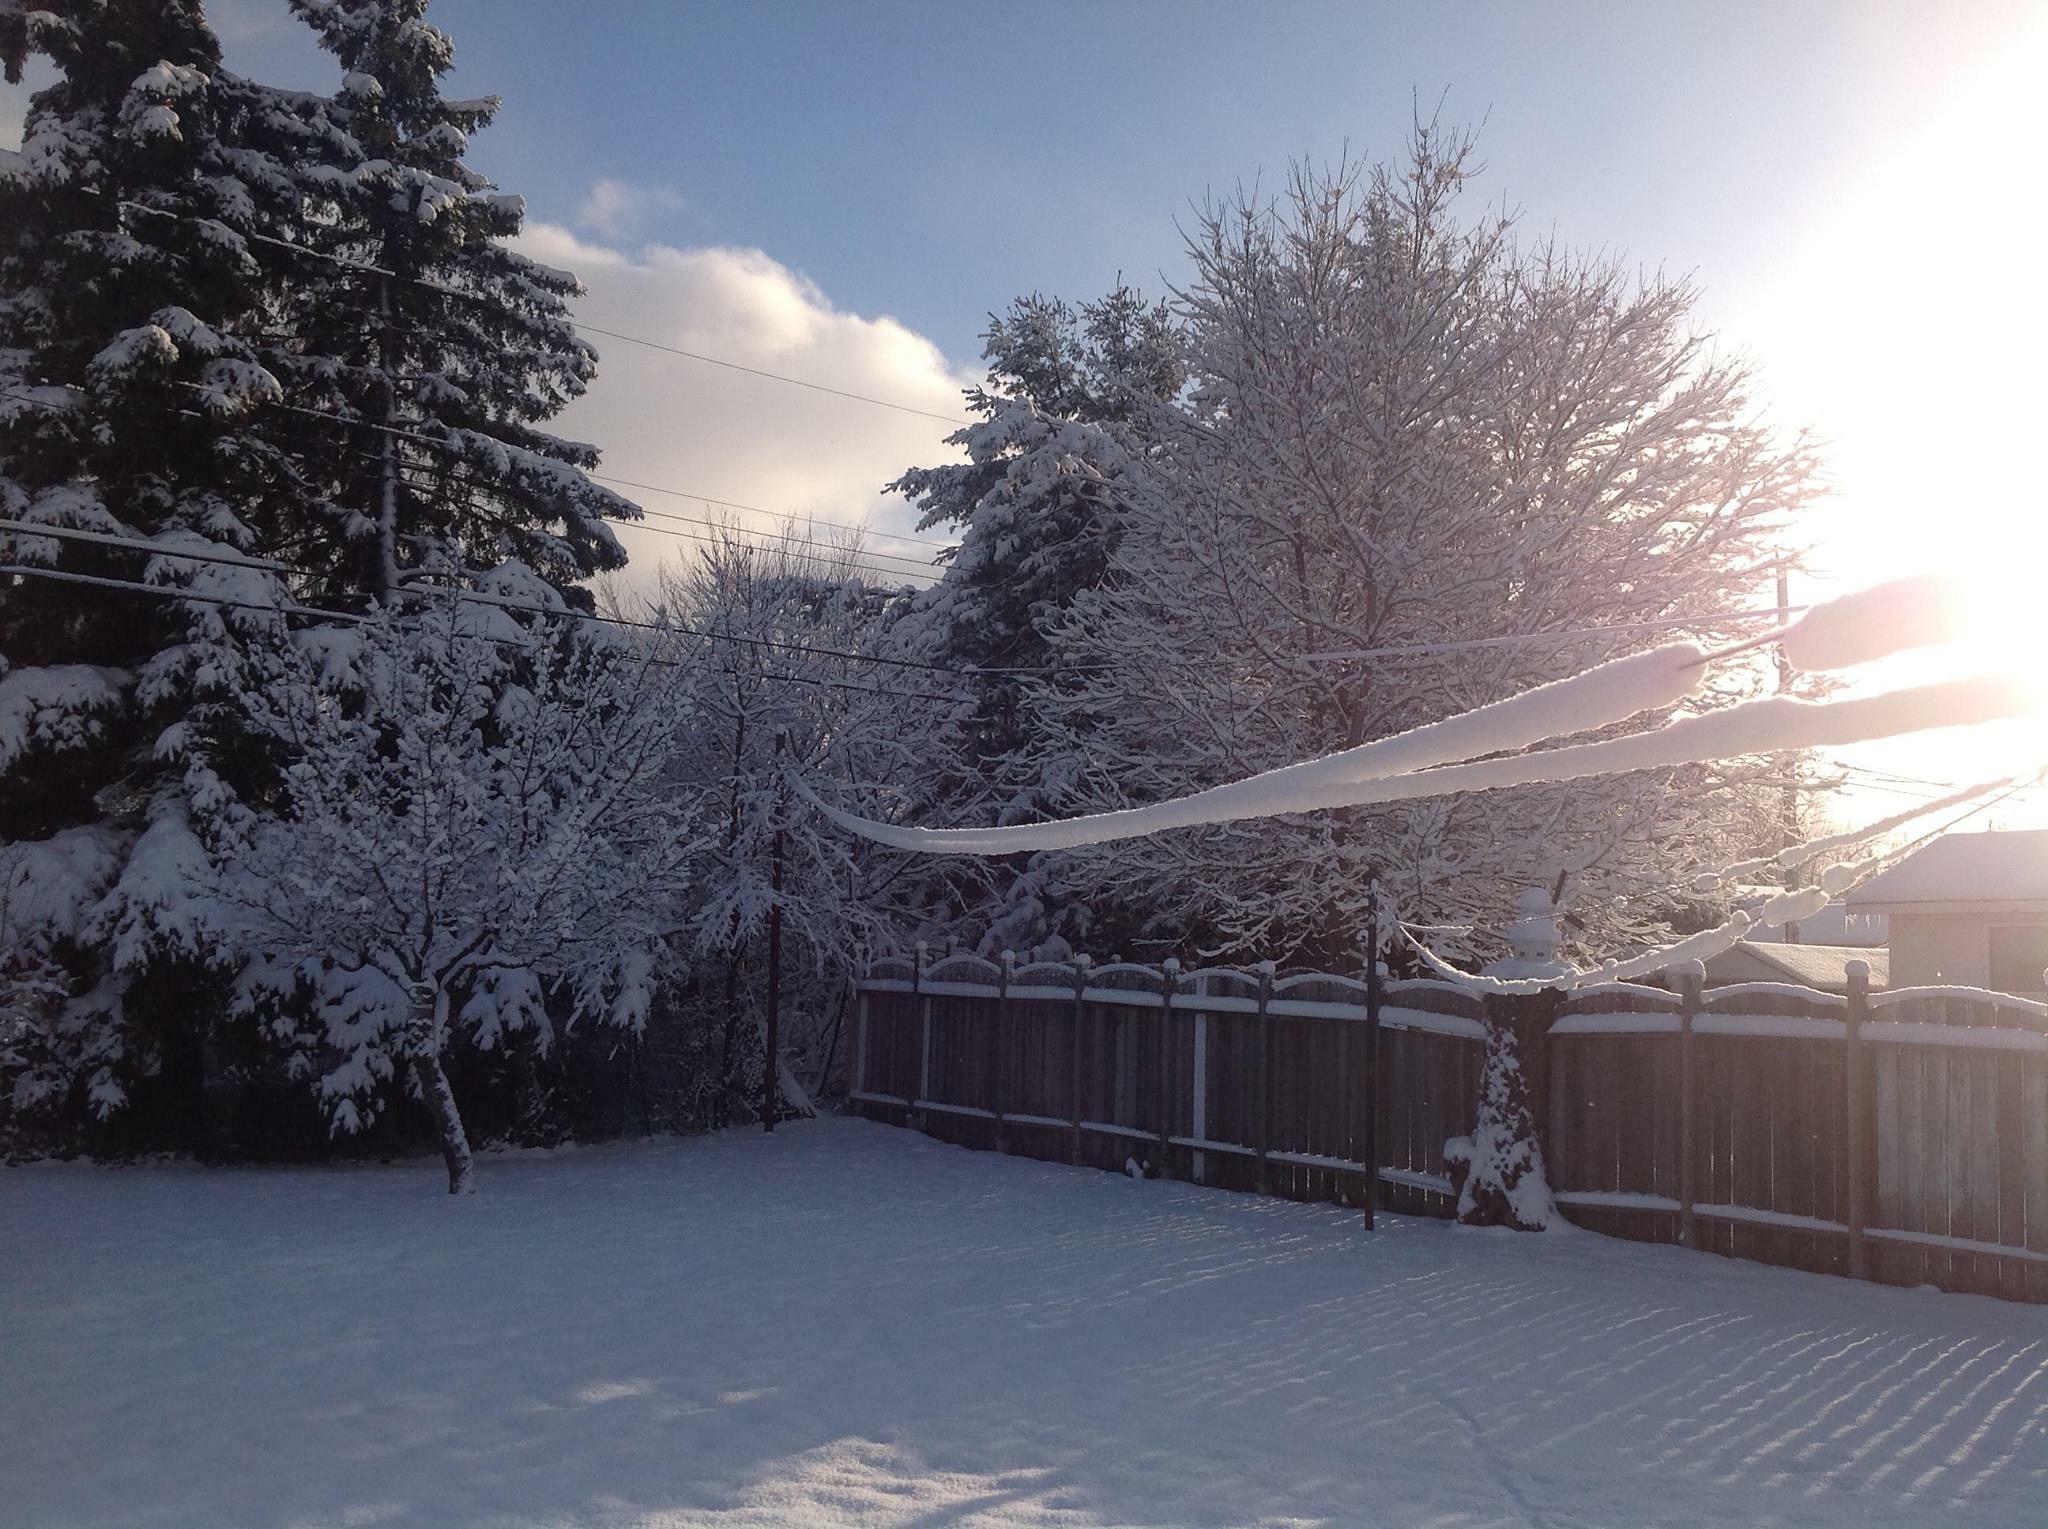 Winter Sparkles by Lorraine Furmanic